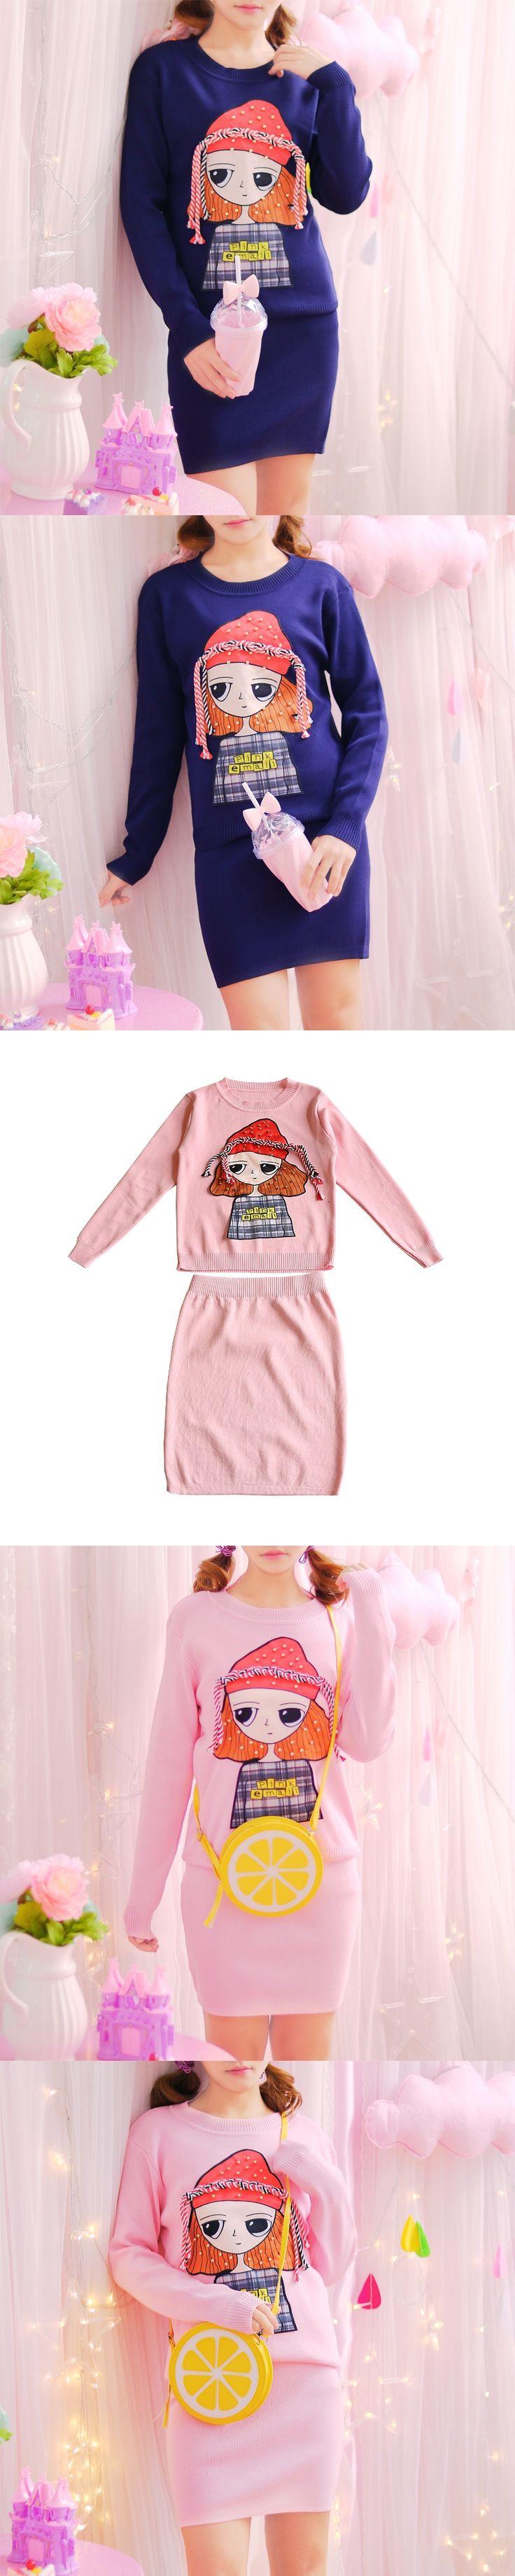 Princess sweet lolita suit Autumn and winter temperament Korean cartoon girl long sleeved sweater stretch wind skirt suit KMY252